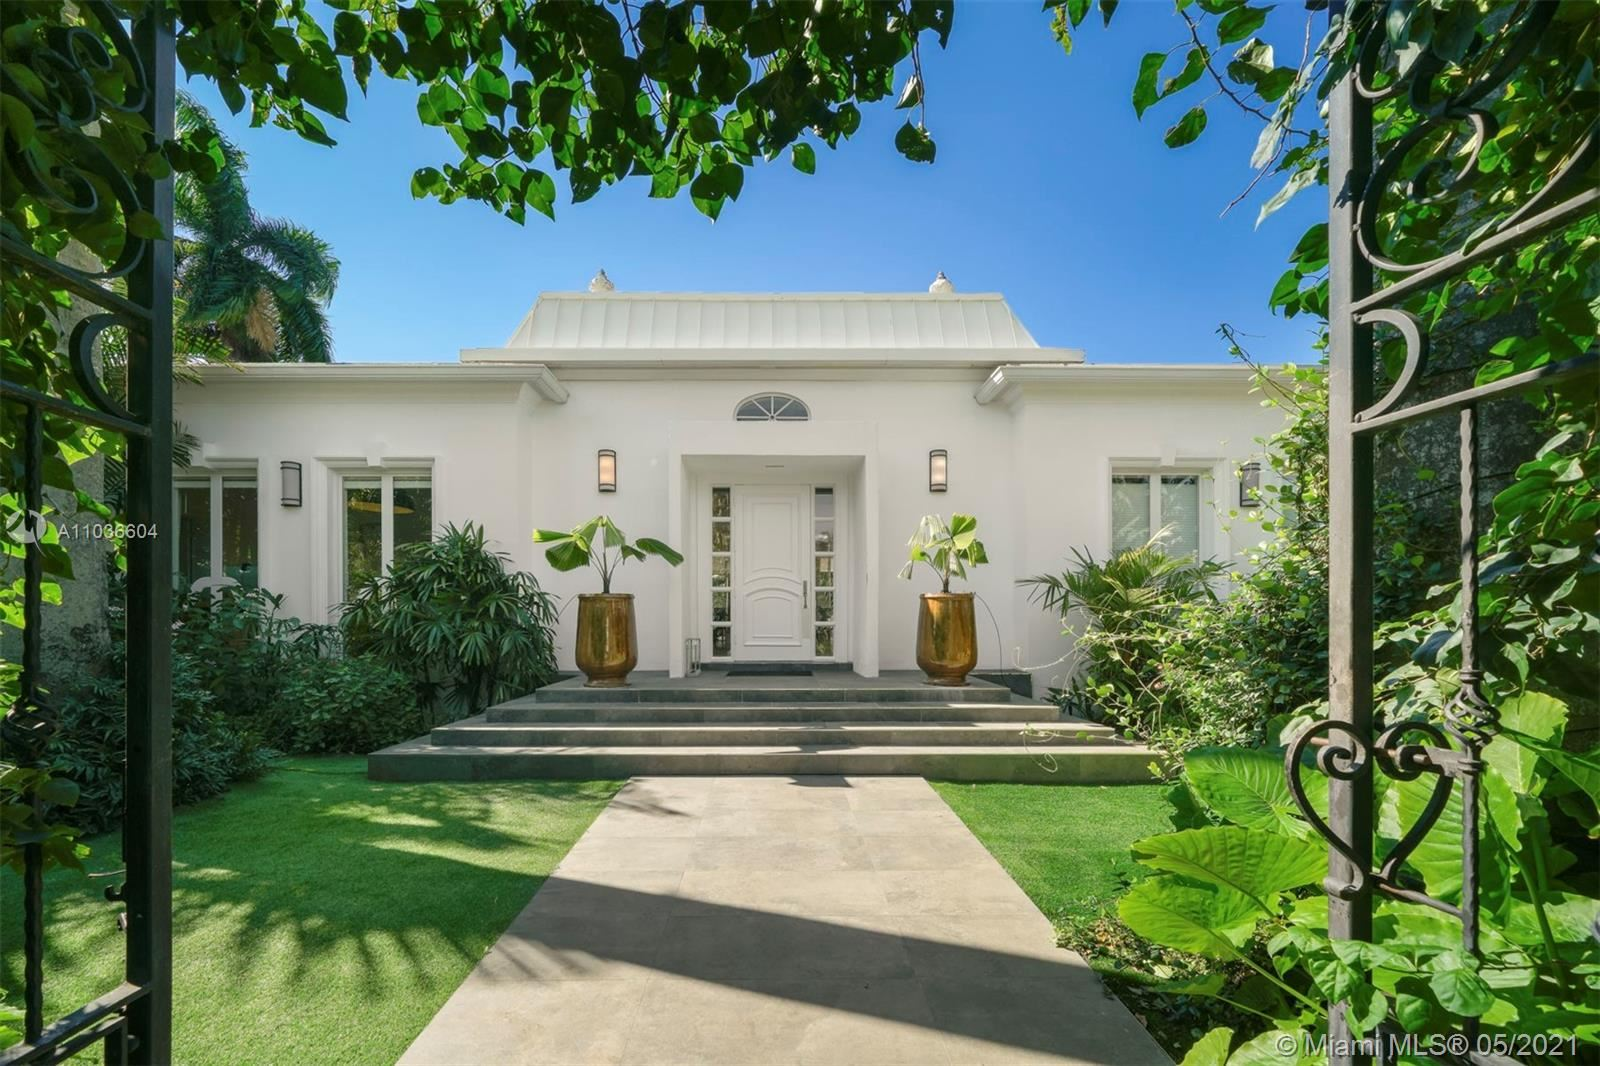 6626 Pinetree Ln, Miami Beach, FL 33141 - #: A11036604